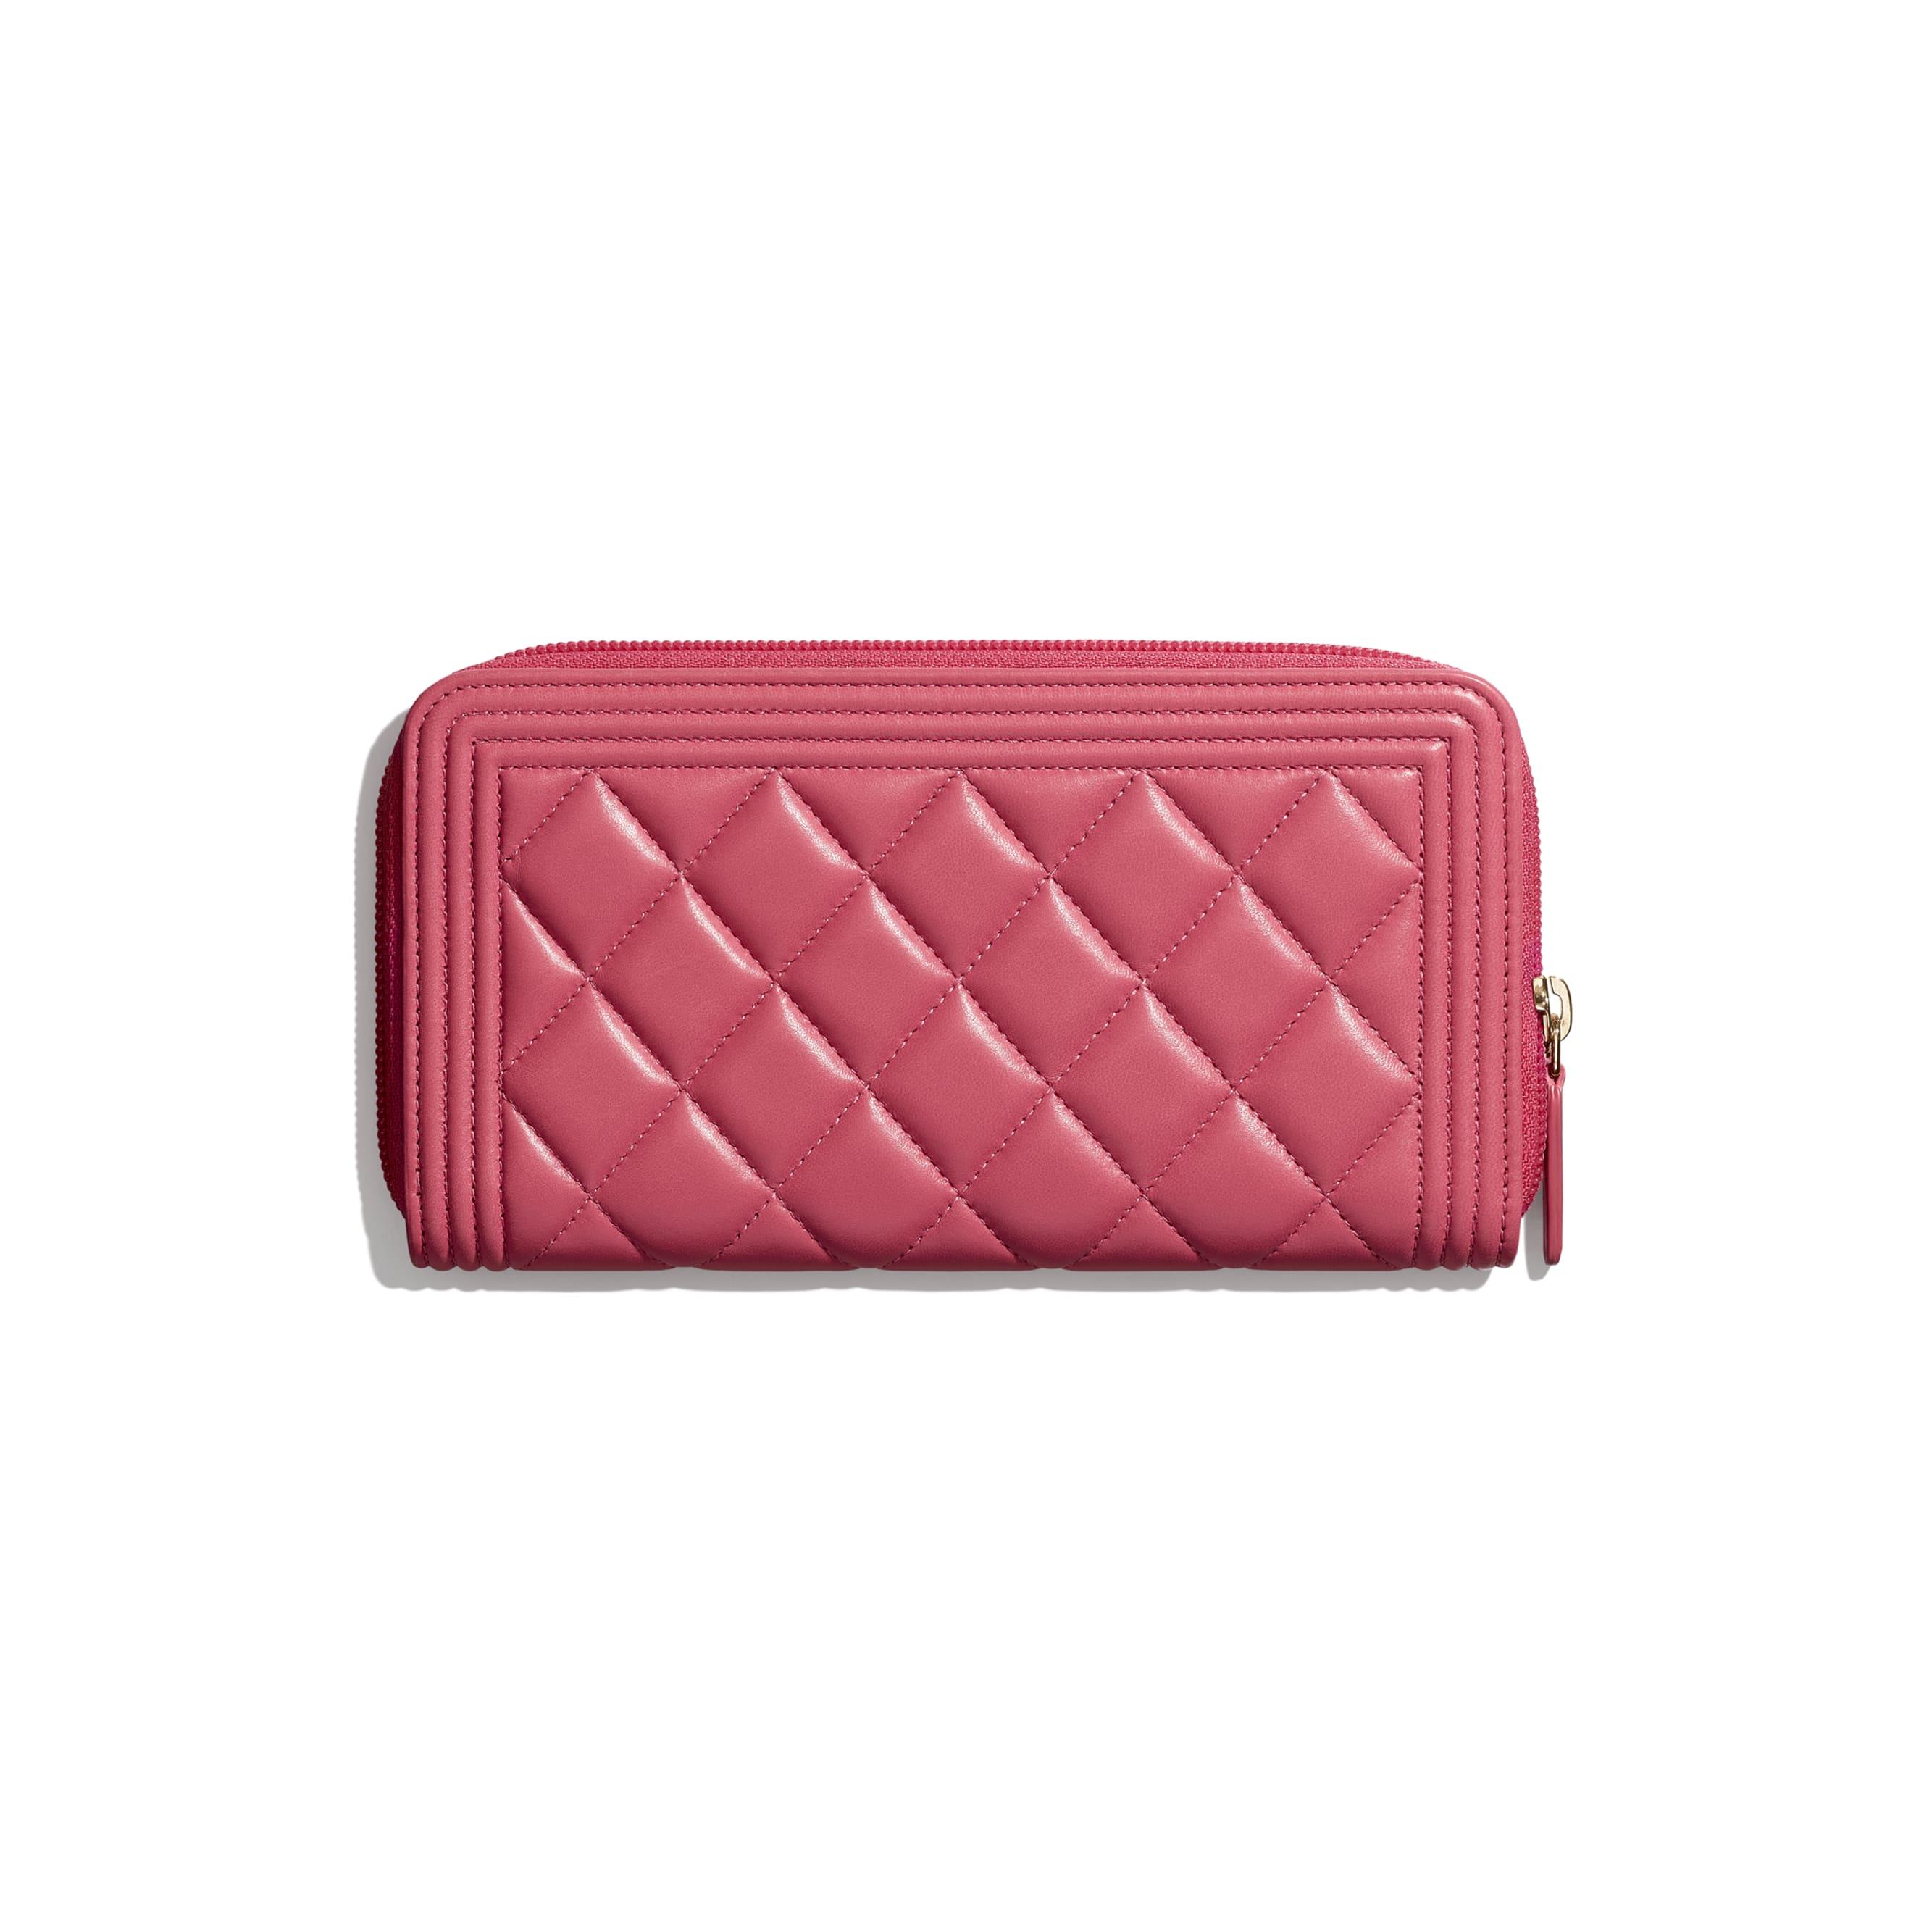 BOY CHANEL Long Zipped Wallet - Pink - Lambskin & Gold-Tone Metal - CHANEL - Alternative view - see standard sized version